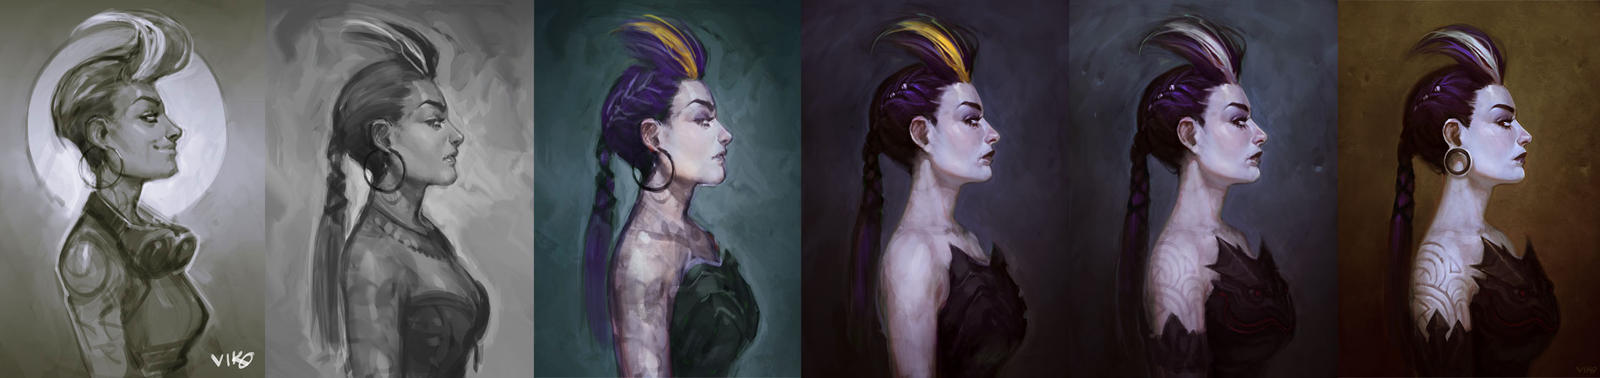 Dark Princess Process by viko-br